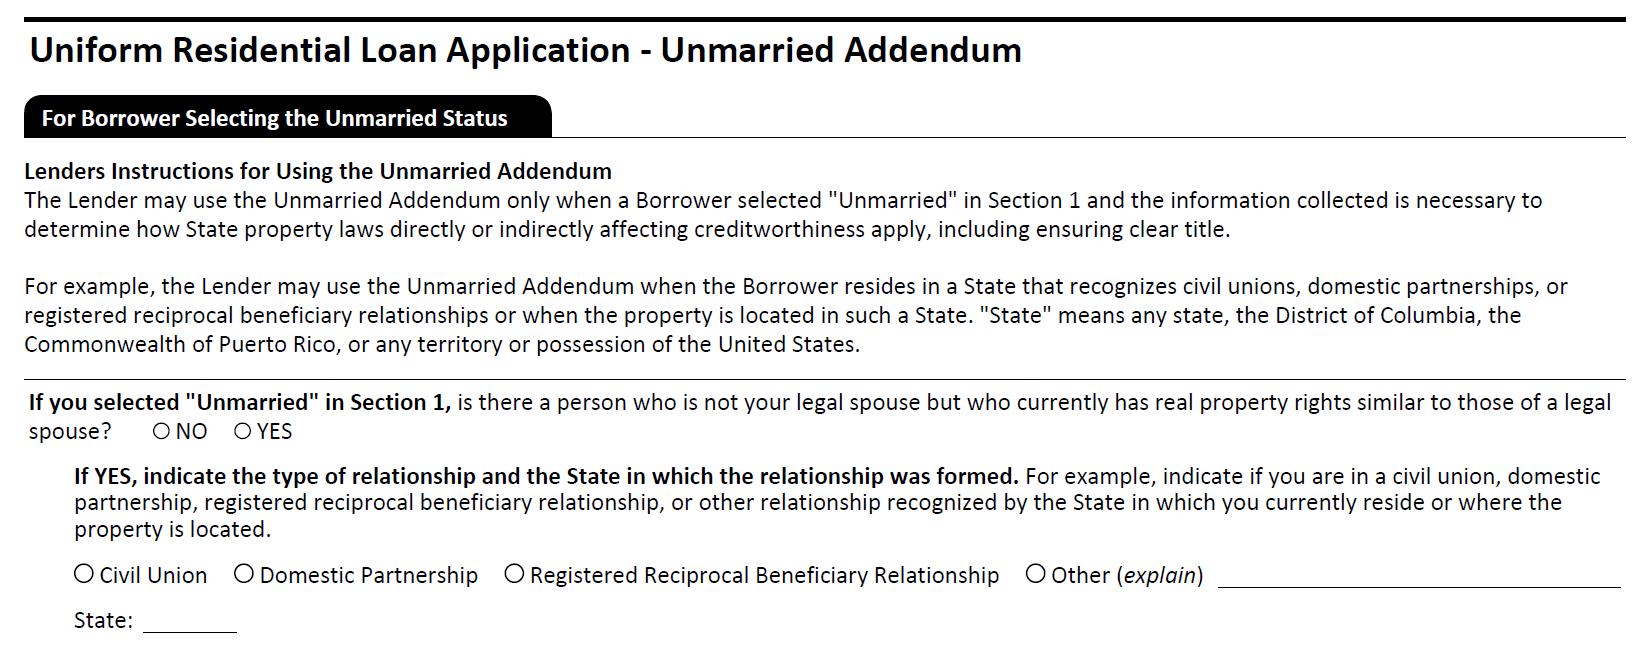 URLA Unmarried Addendum